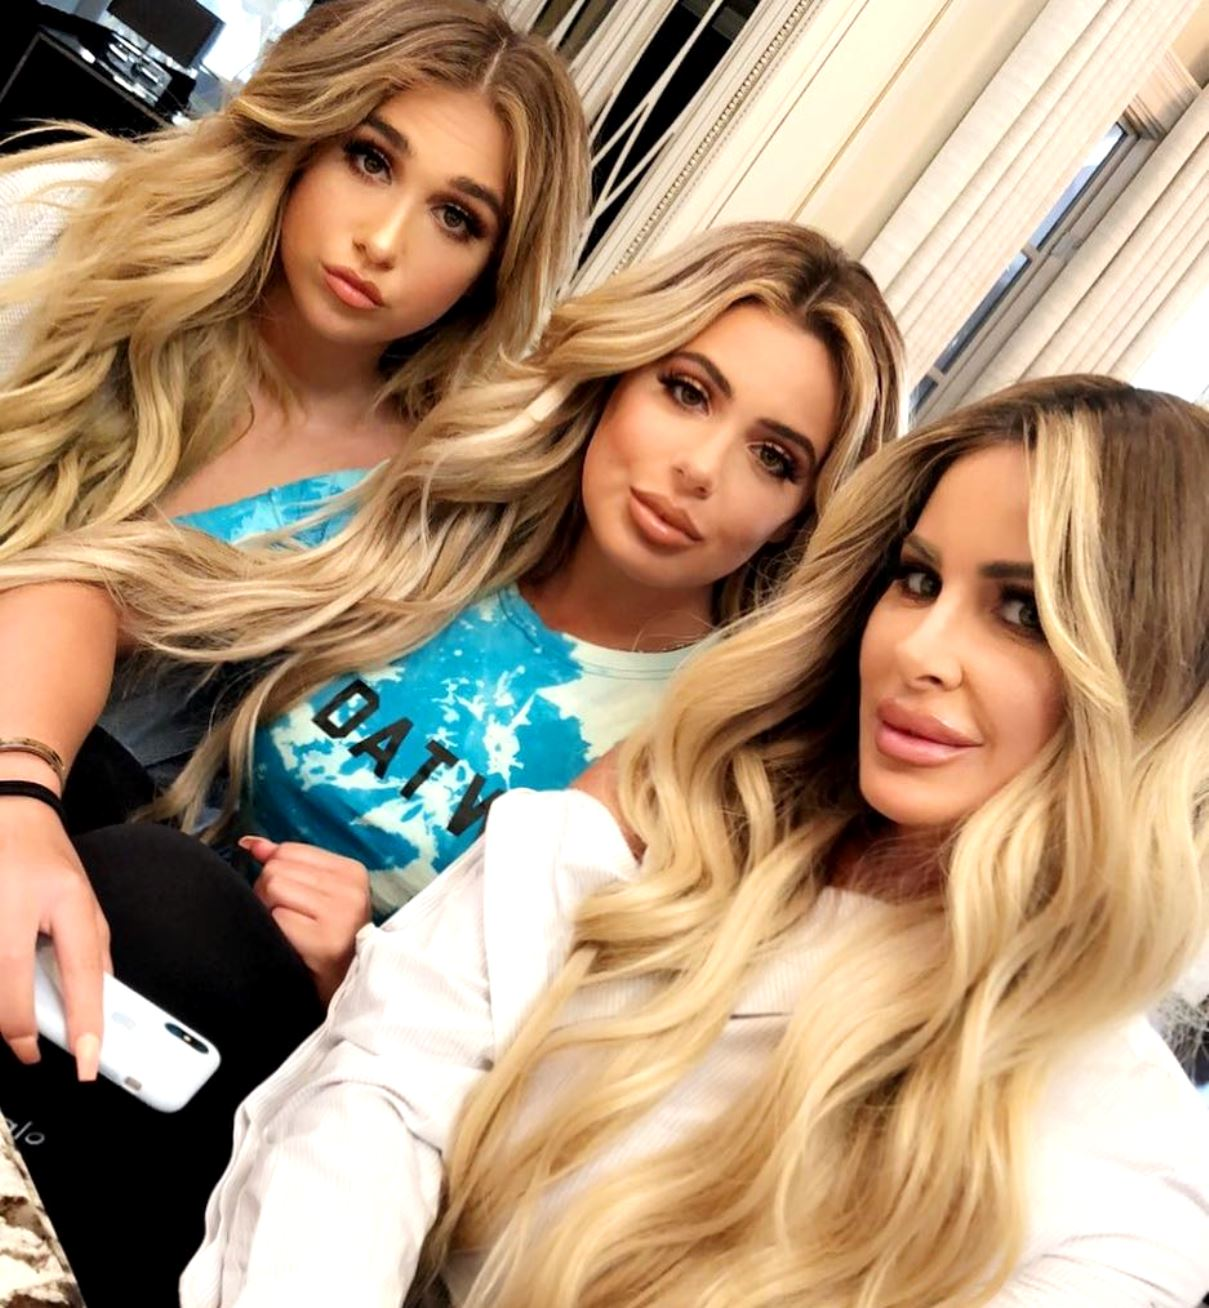 Kim Zolciak Starts Makeup Line KAB Comestics With Ariana and Brielle Biermann